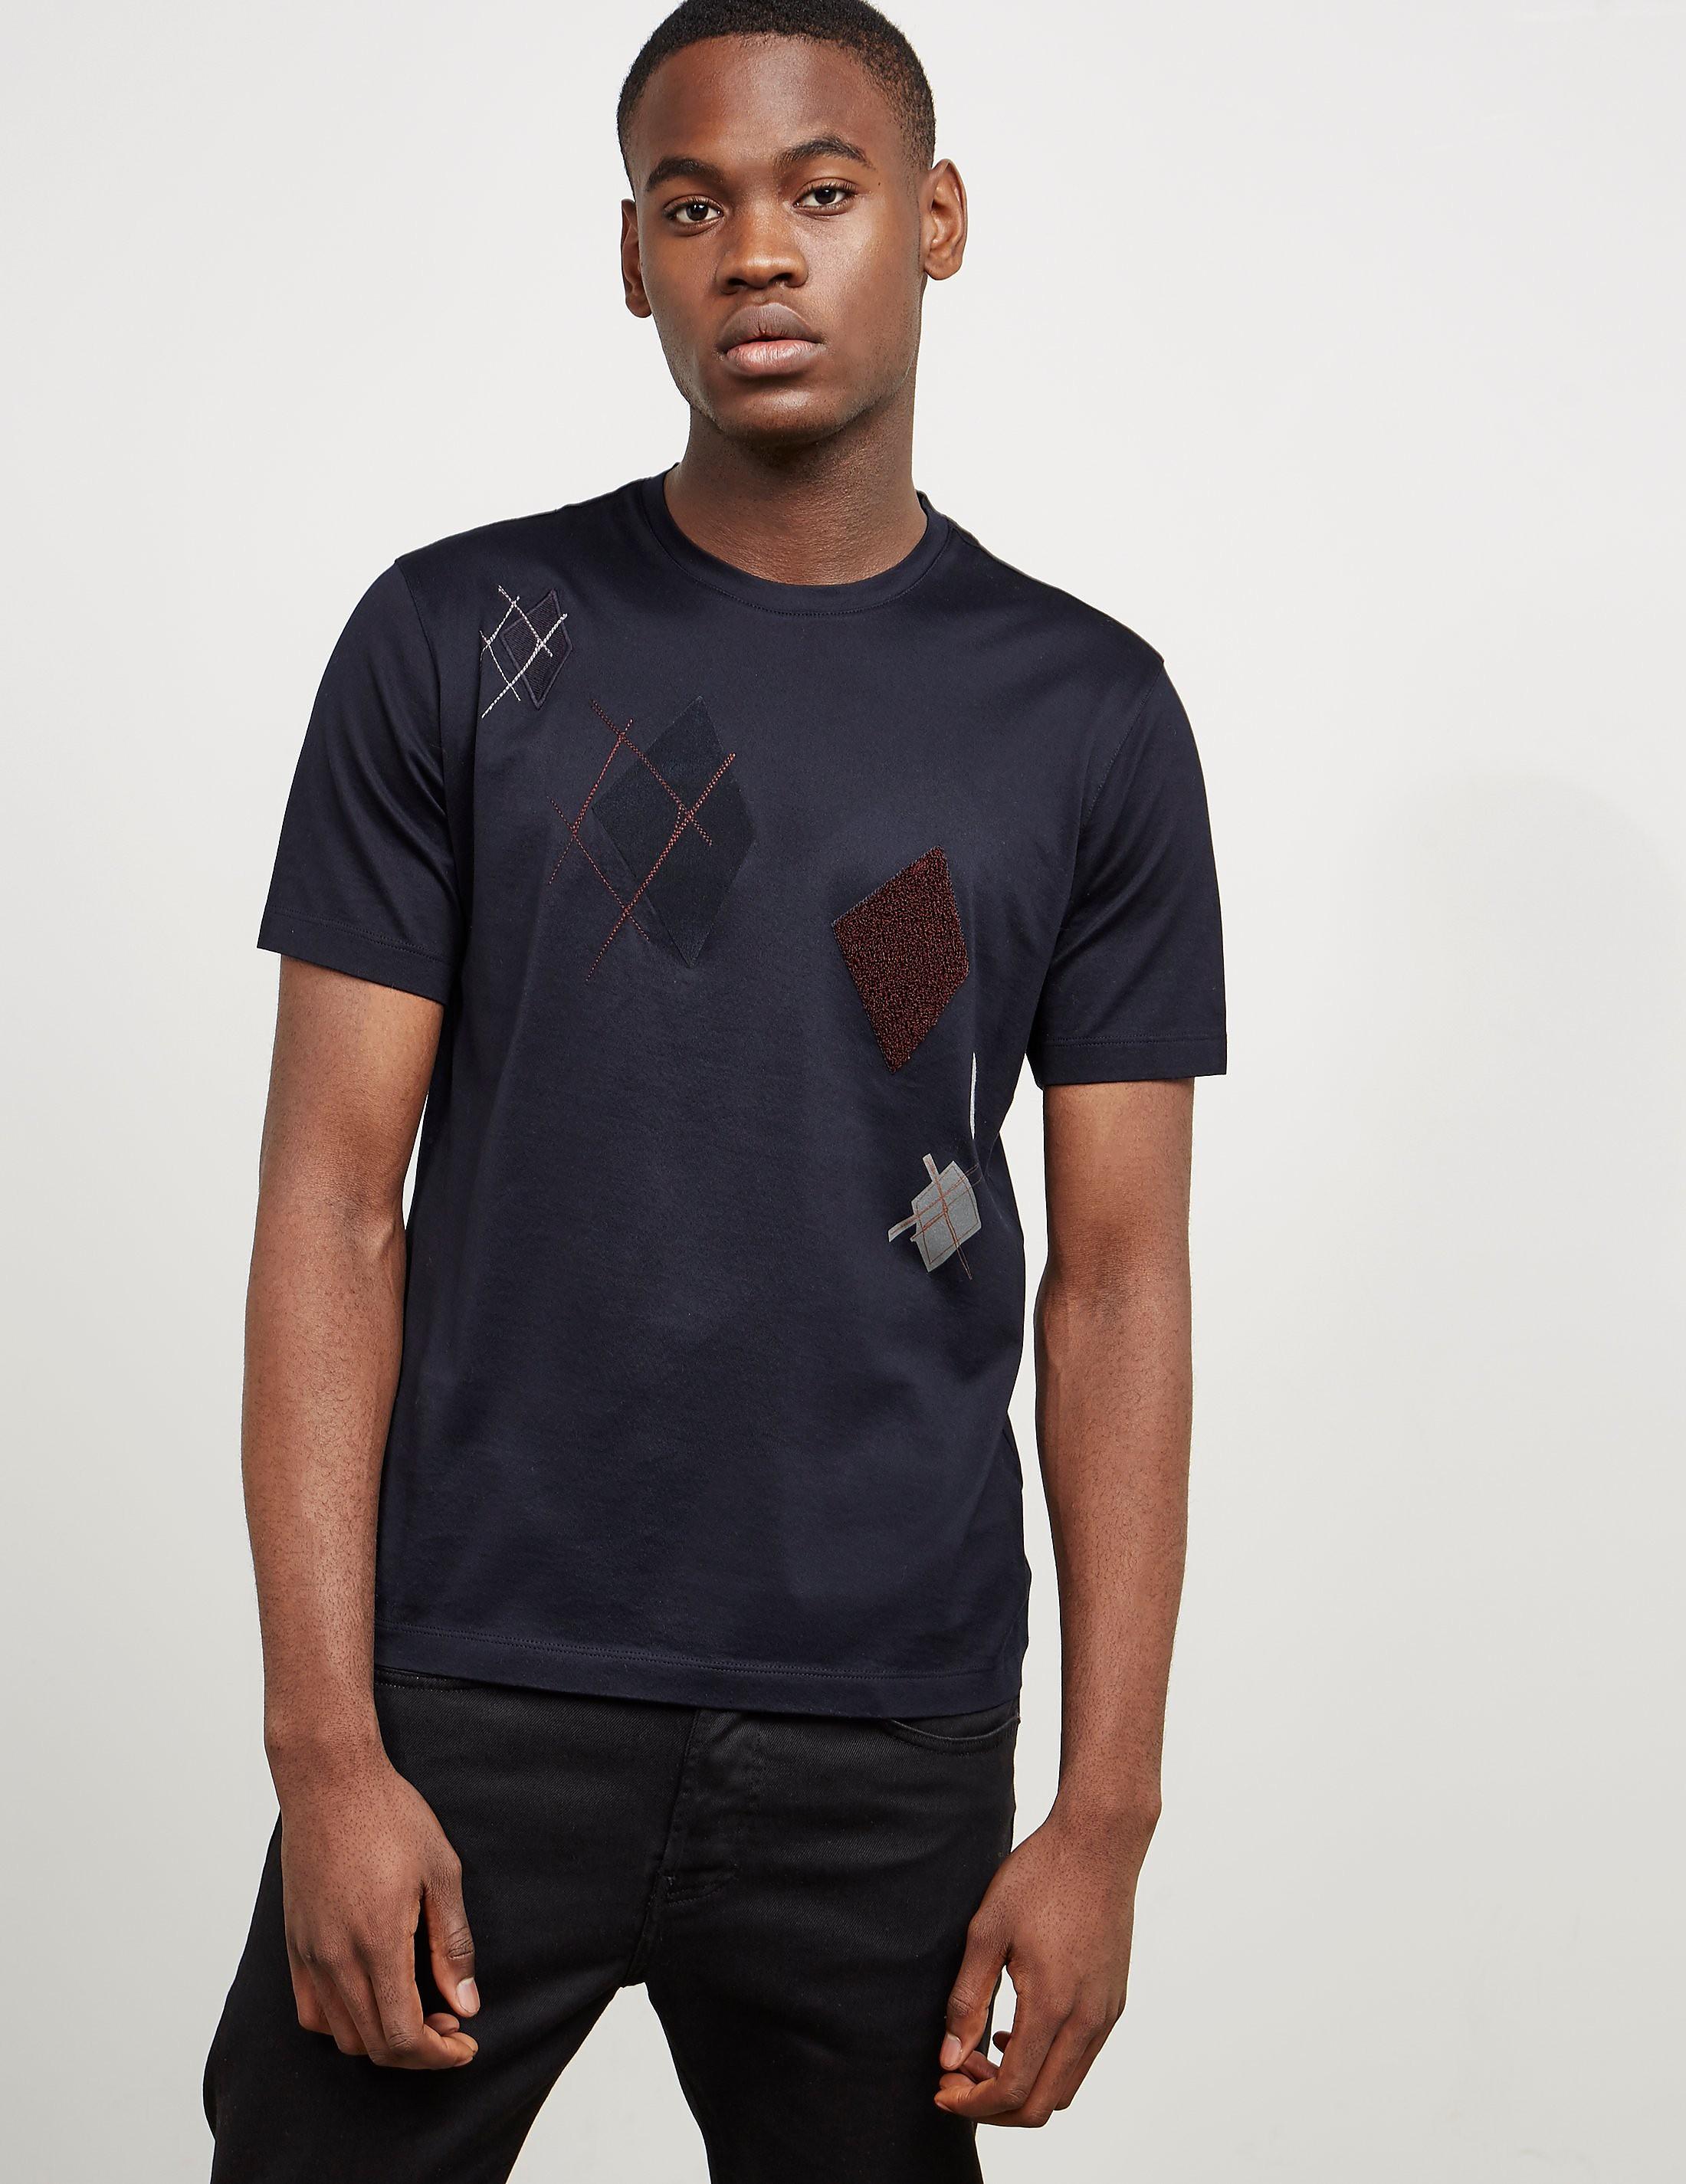 Z Zegna Argyle Applique Short Sleeve T-Shirt